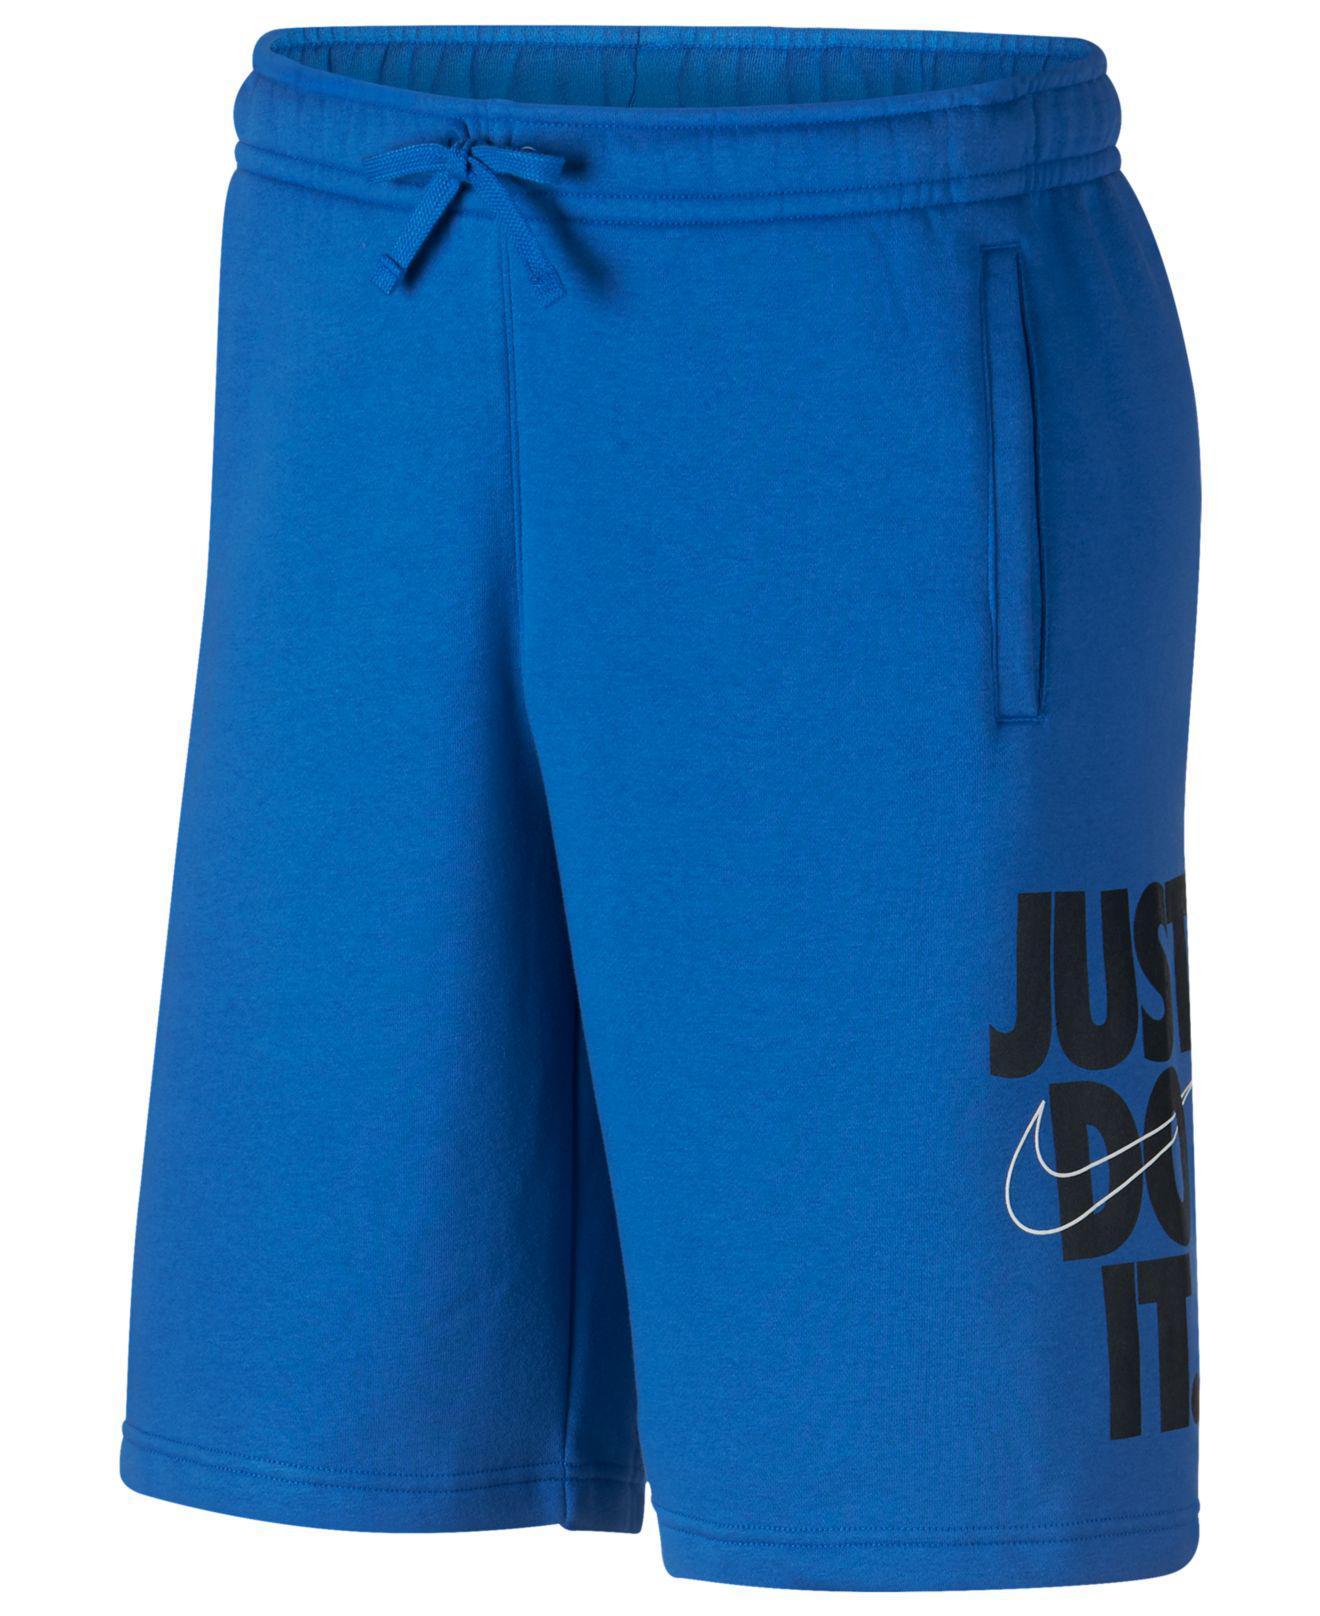 31fd757fa51 Men's Blue Just Do It Fleece Shorts